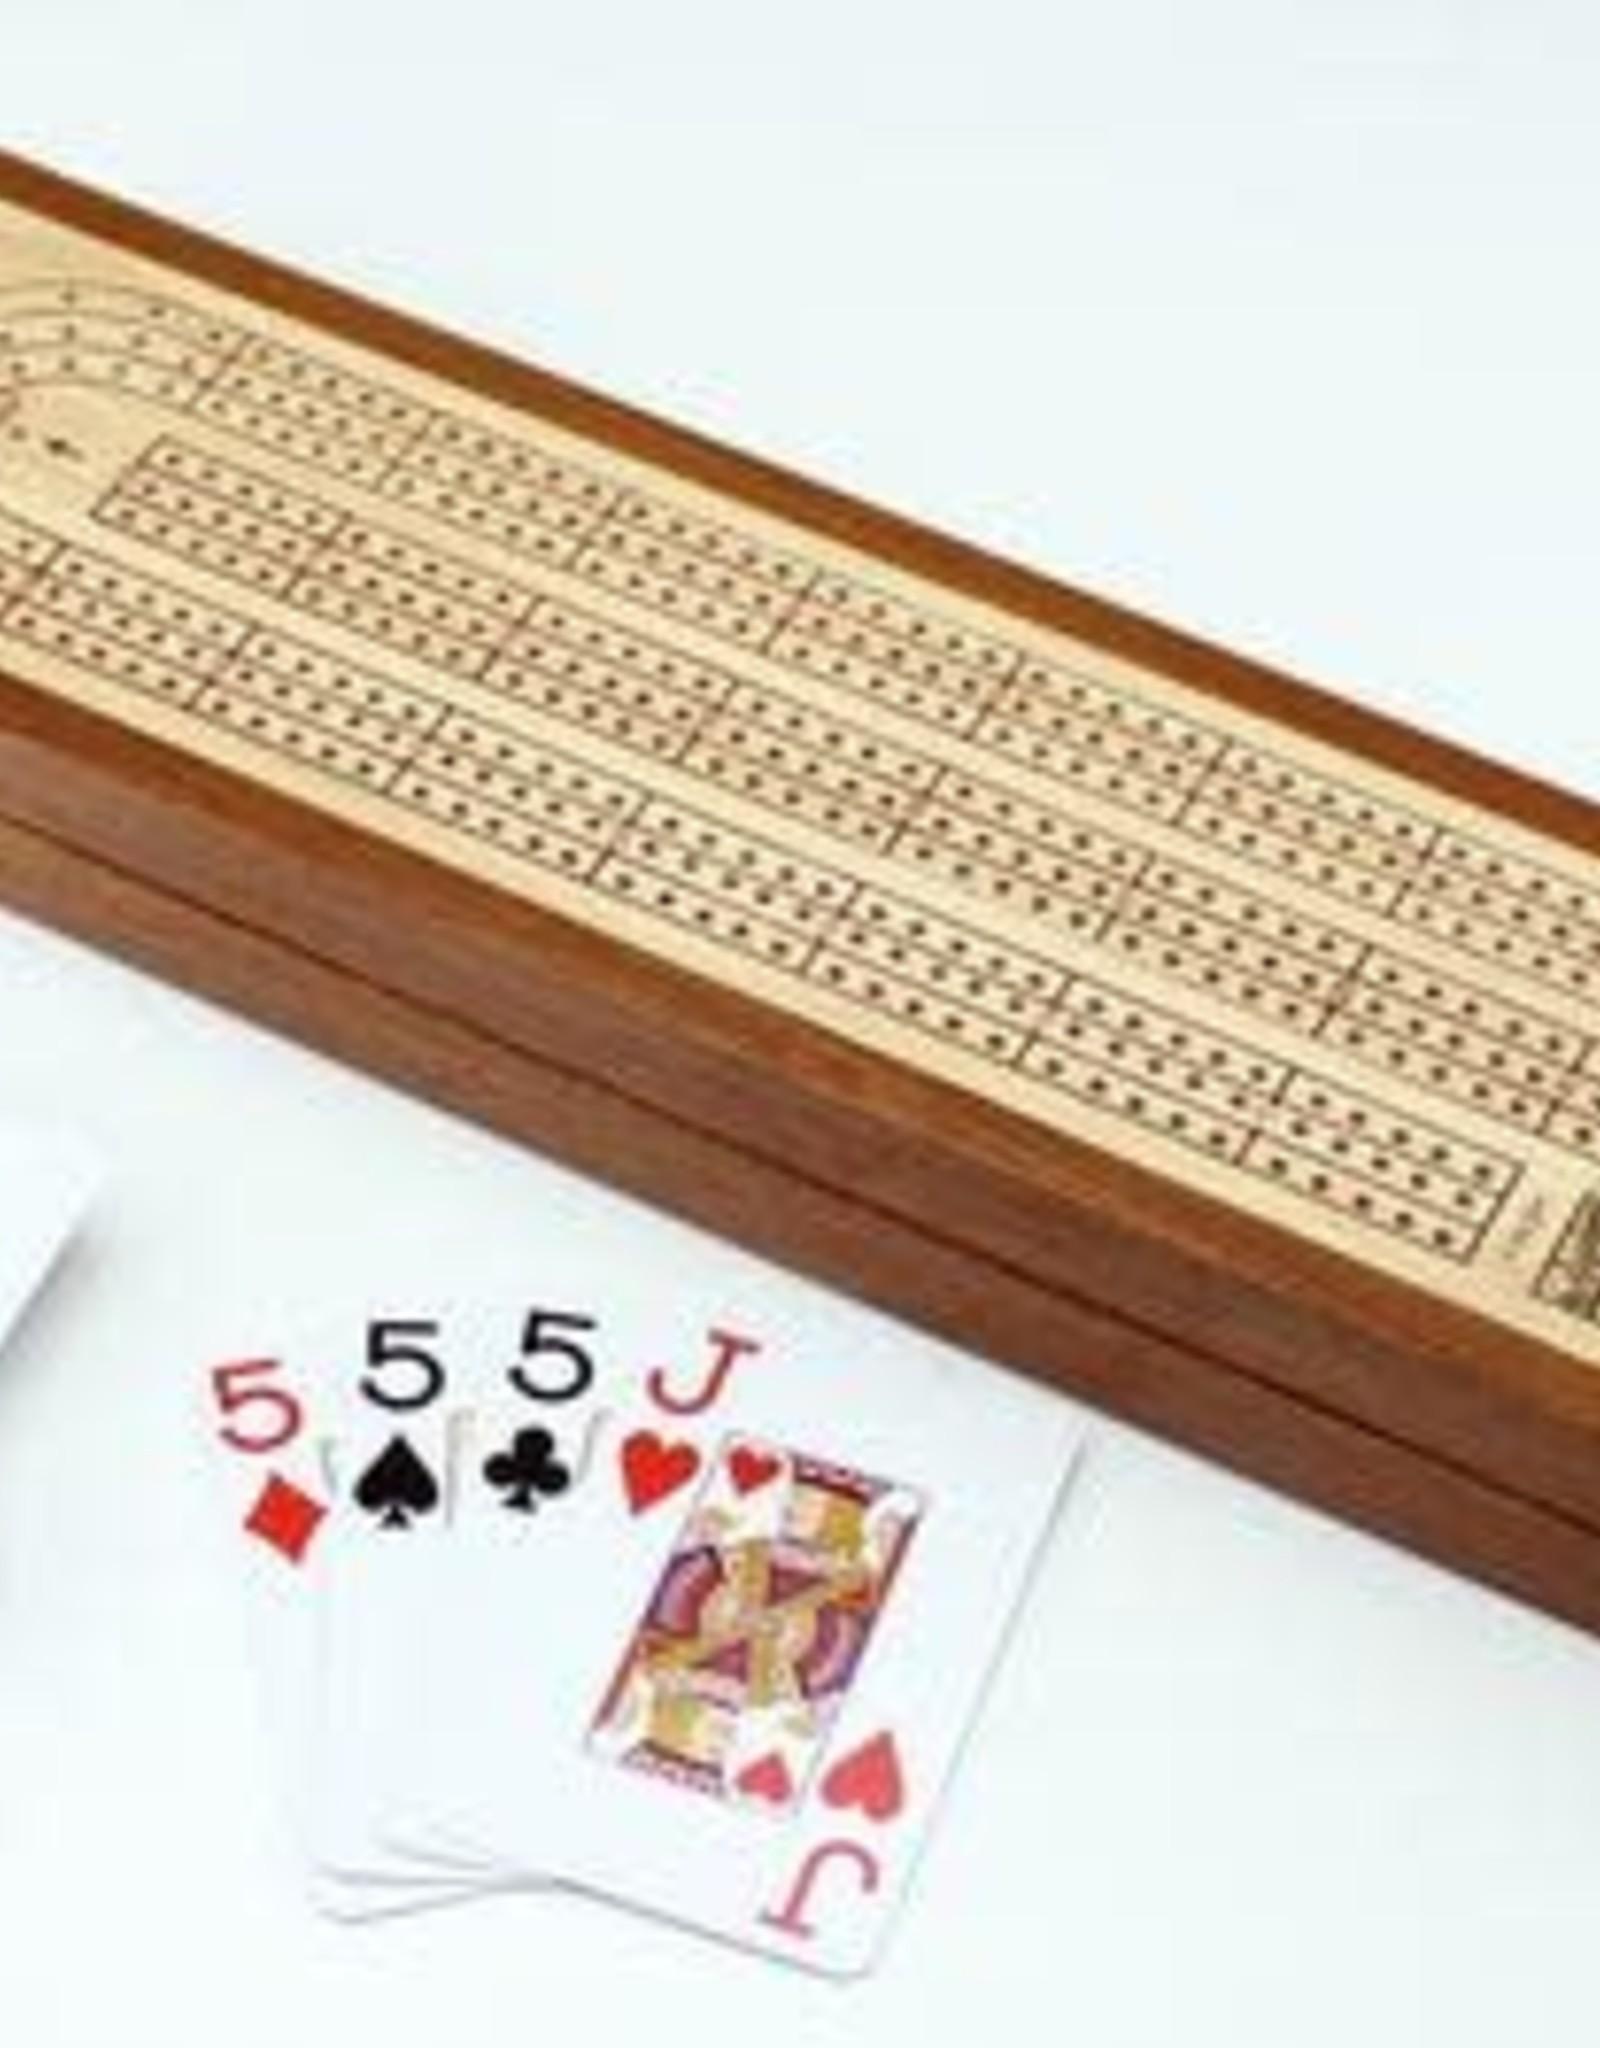 Mind Matters Cribbage board with Piatnik cards